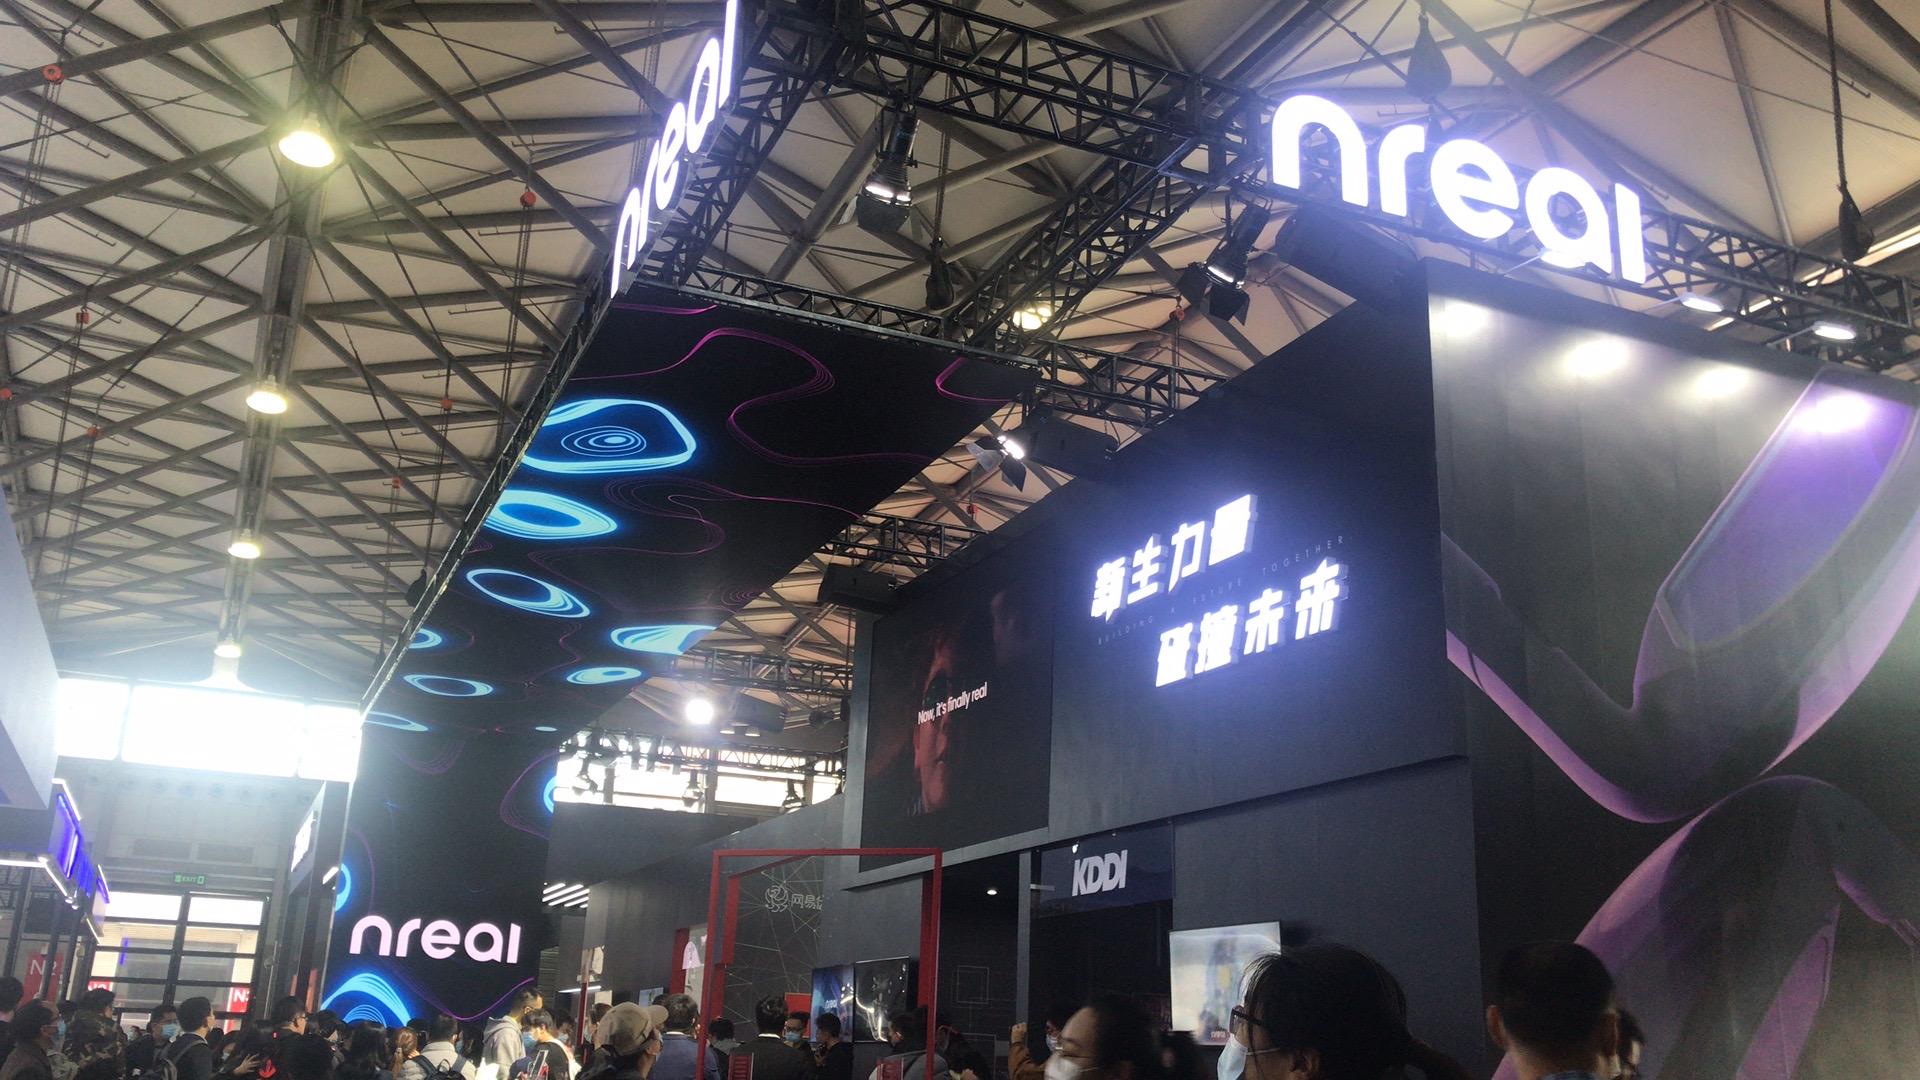 MWC2021丨Nreal设6大互动体验区并秀新品,展示5G+MR出海落地成果